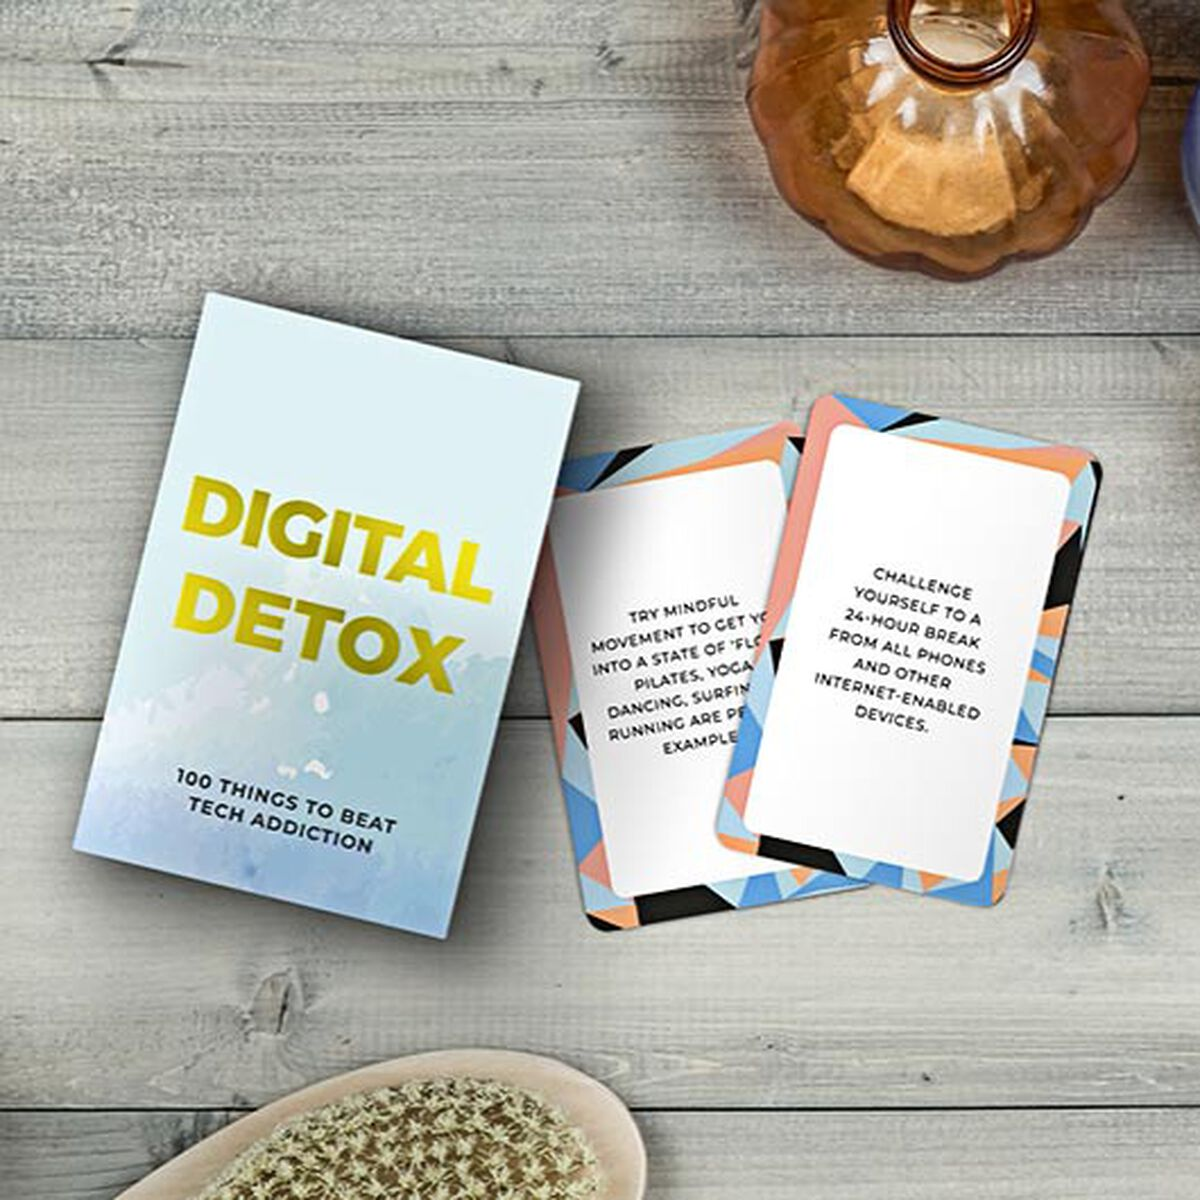 Gift Digital detox